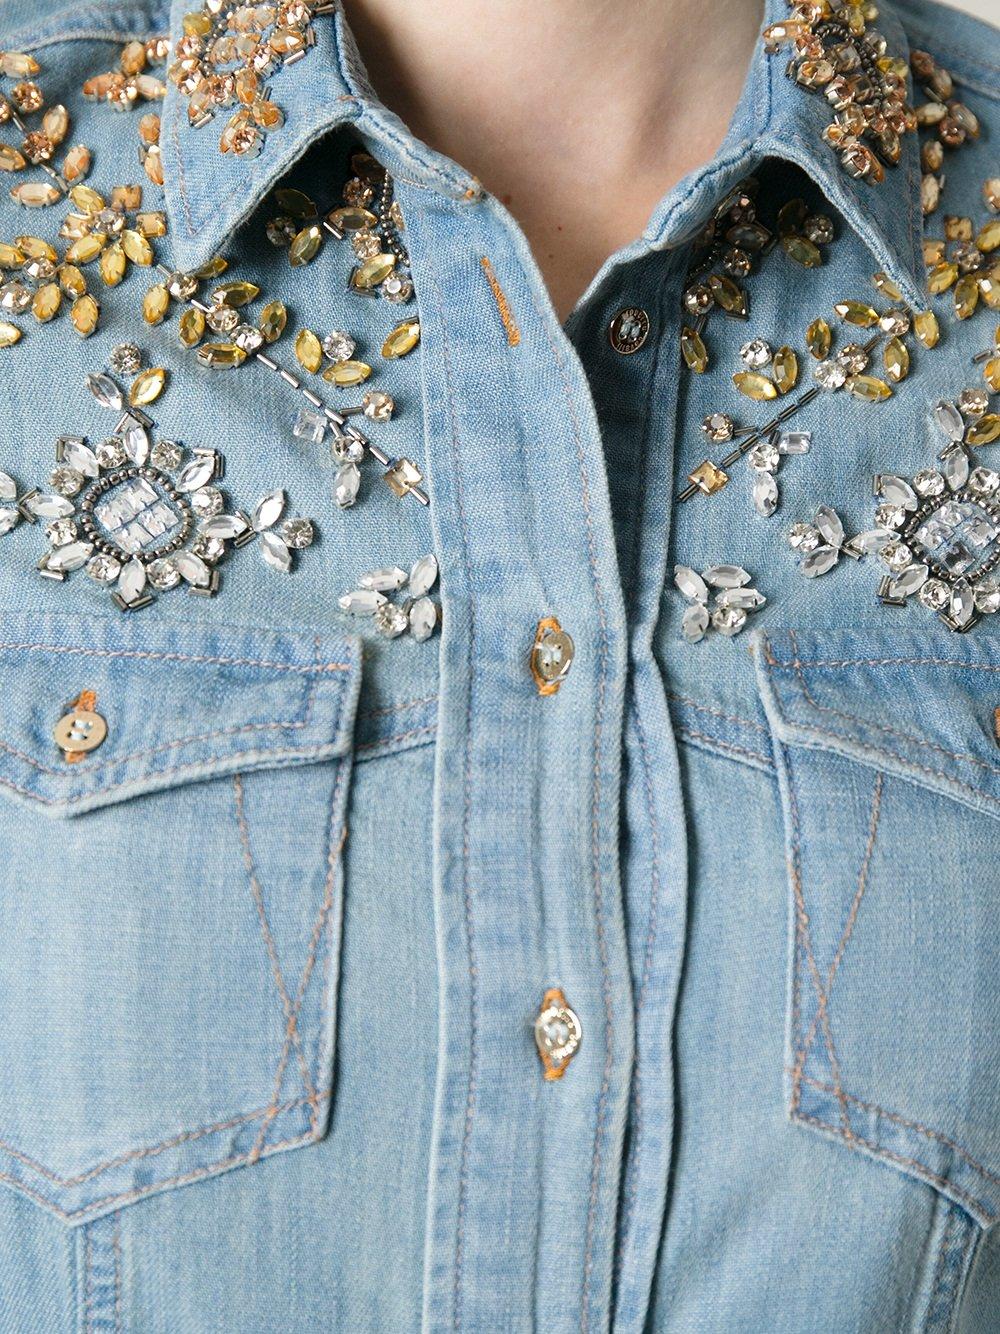 Lyst roberto cavalli crystal embellished denim shirt in blue for Women s embellished t shirts